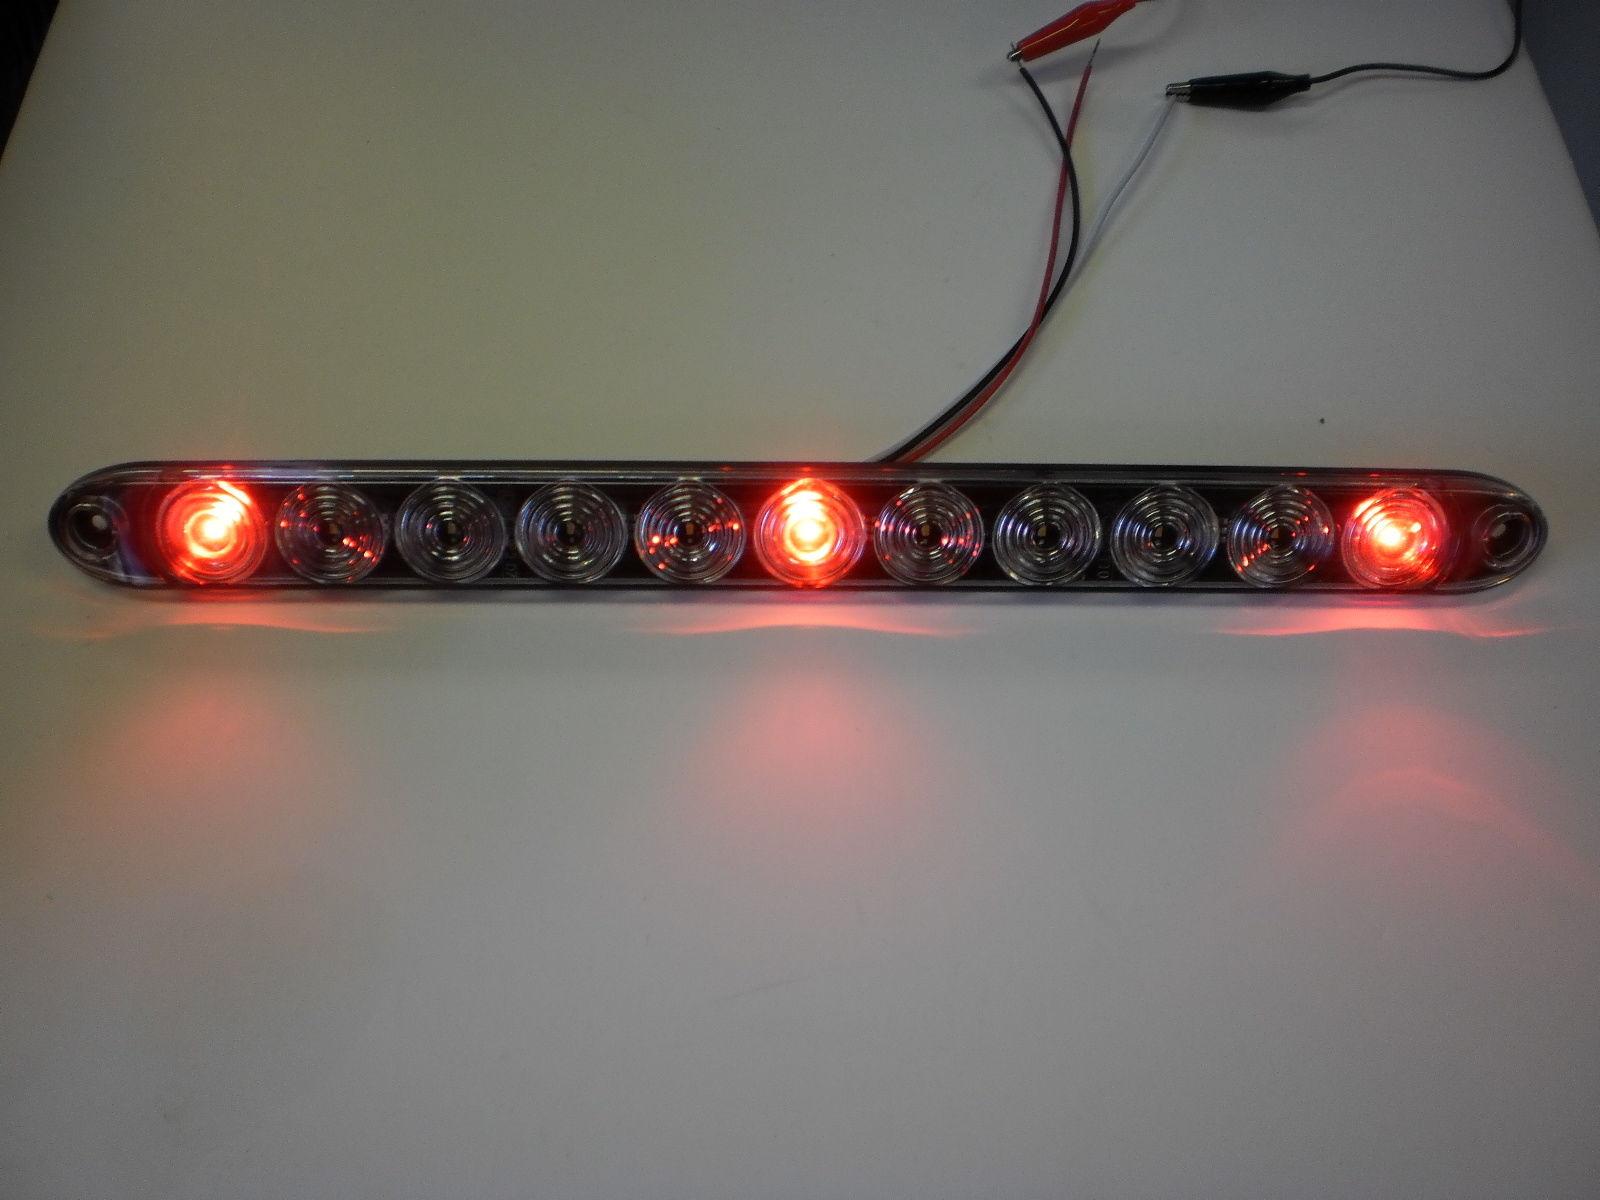 2 tecniq red 3 id bar w white reverse light 11 led 15 camper rh ebay com TecNiq S170 TecNiq S170